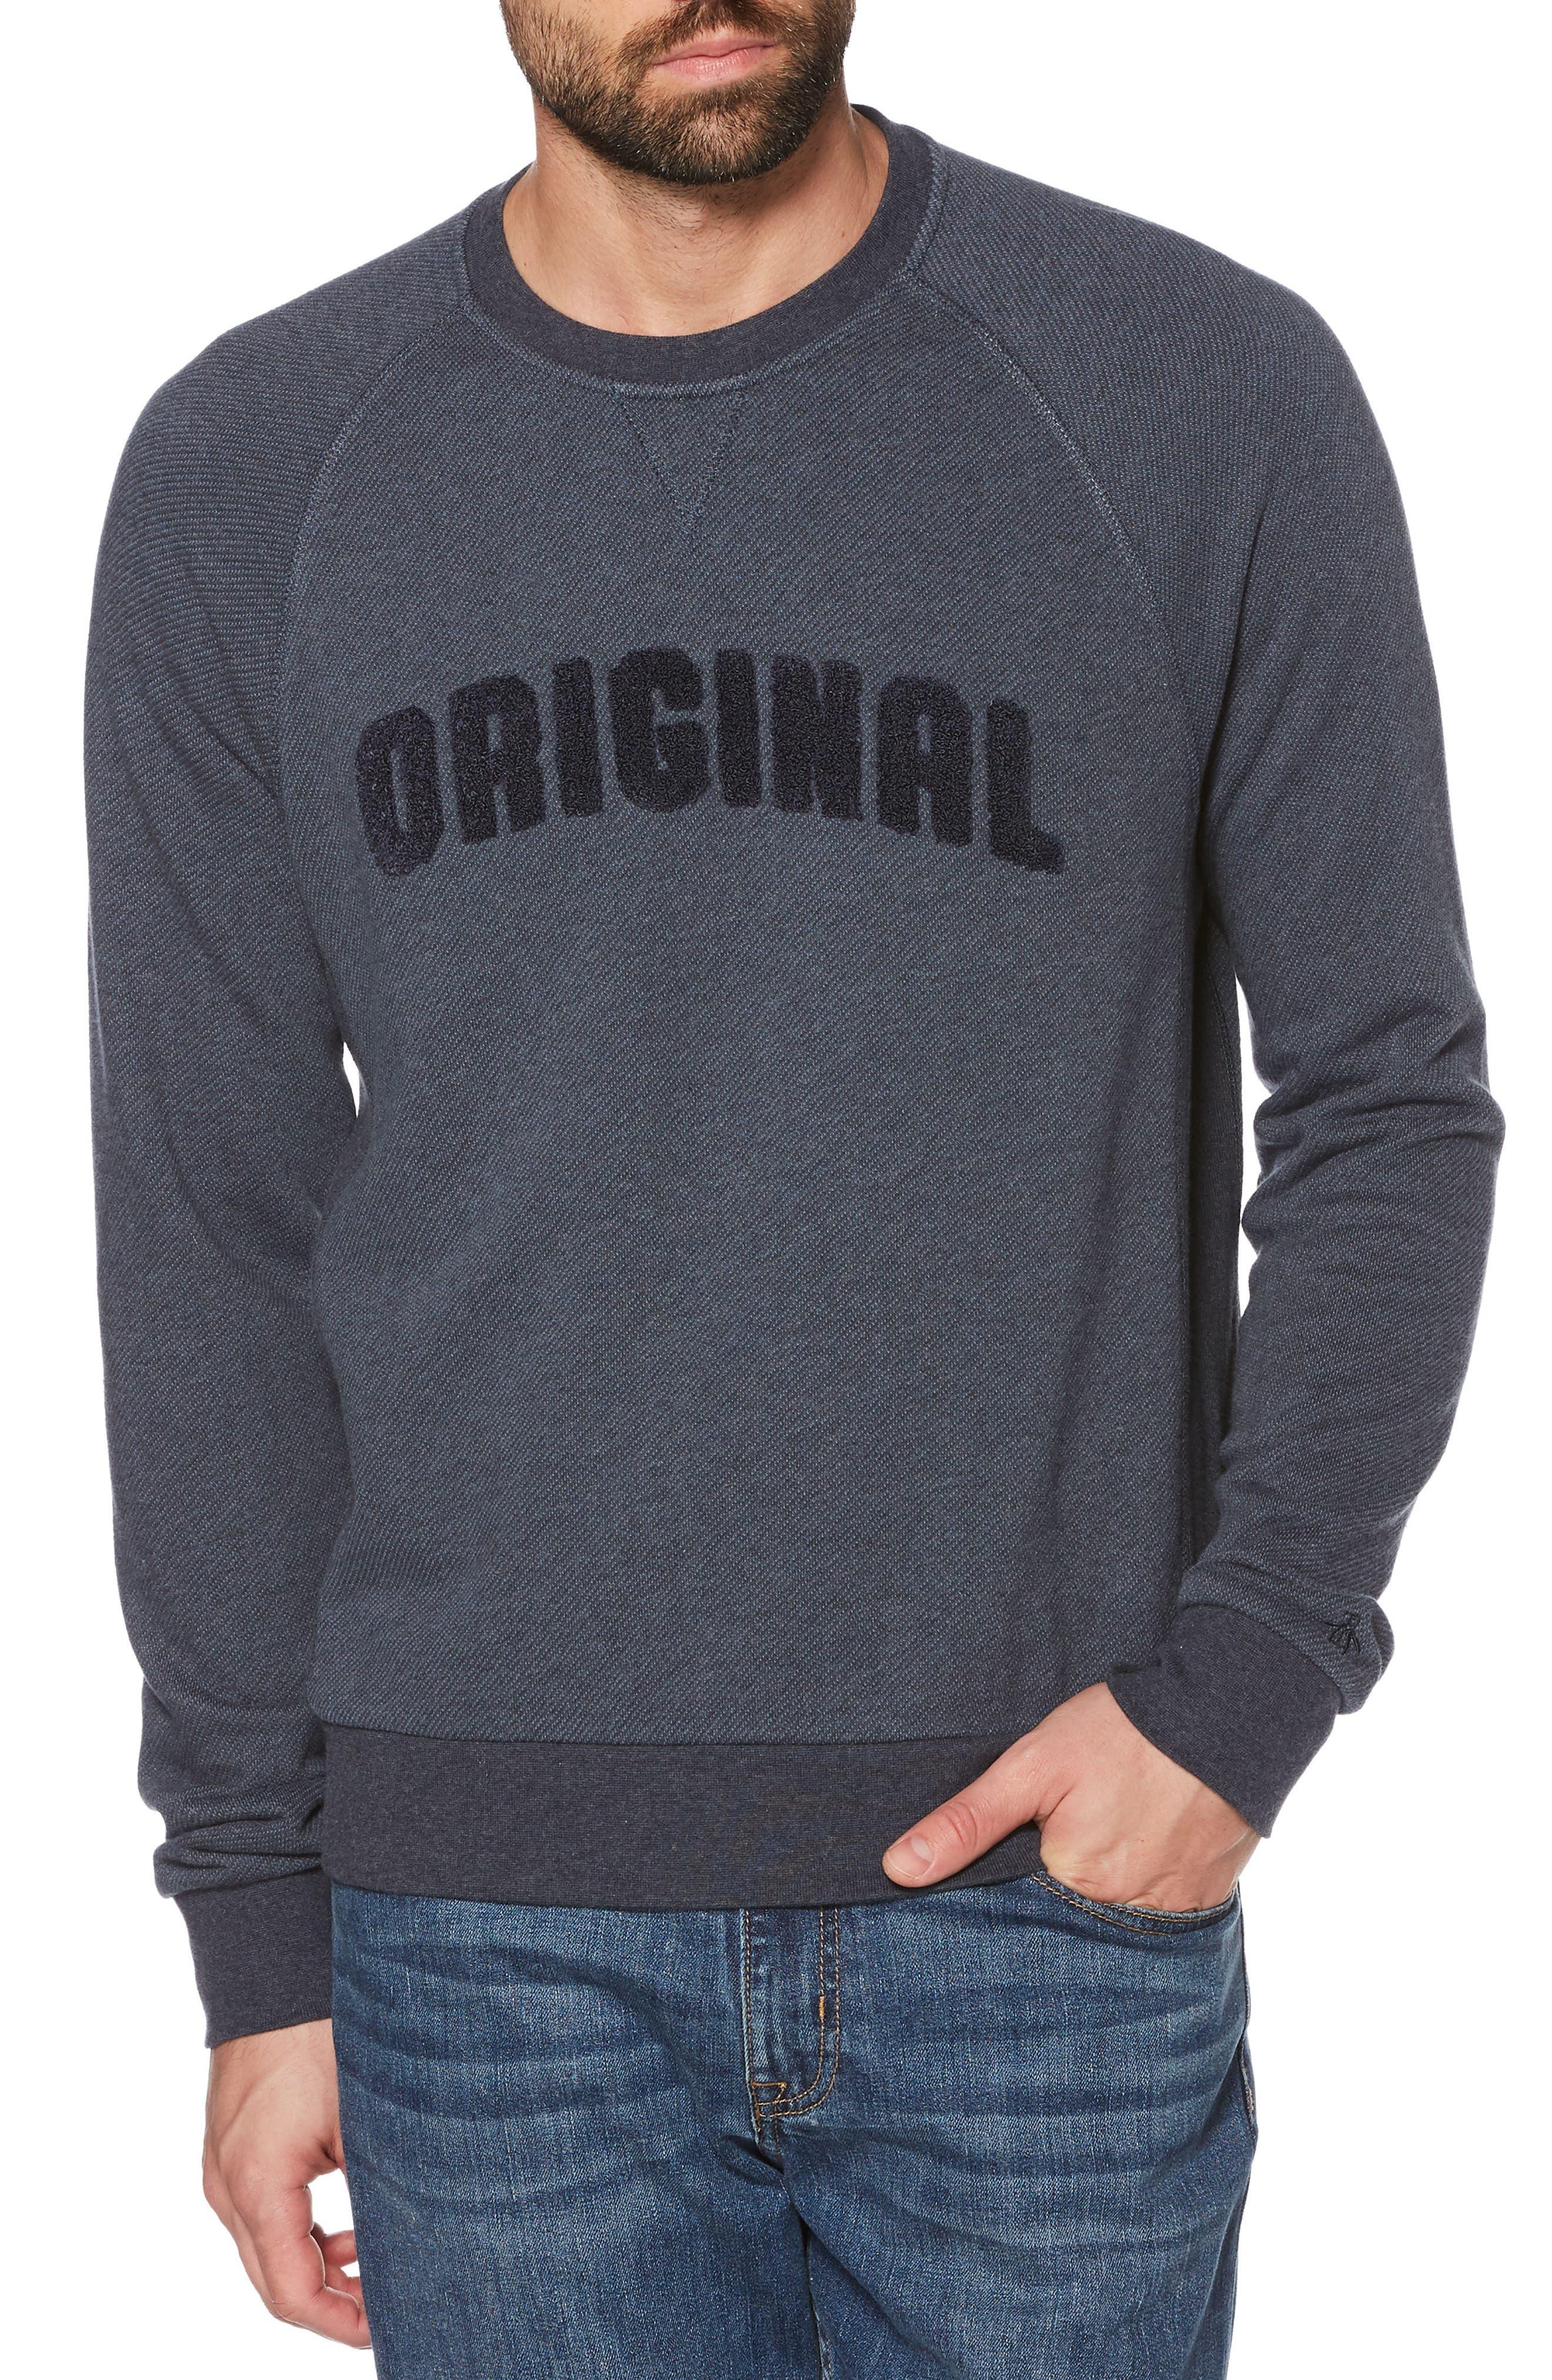 Original Penguin Bouclé Sweatshirt